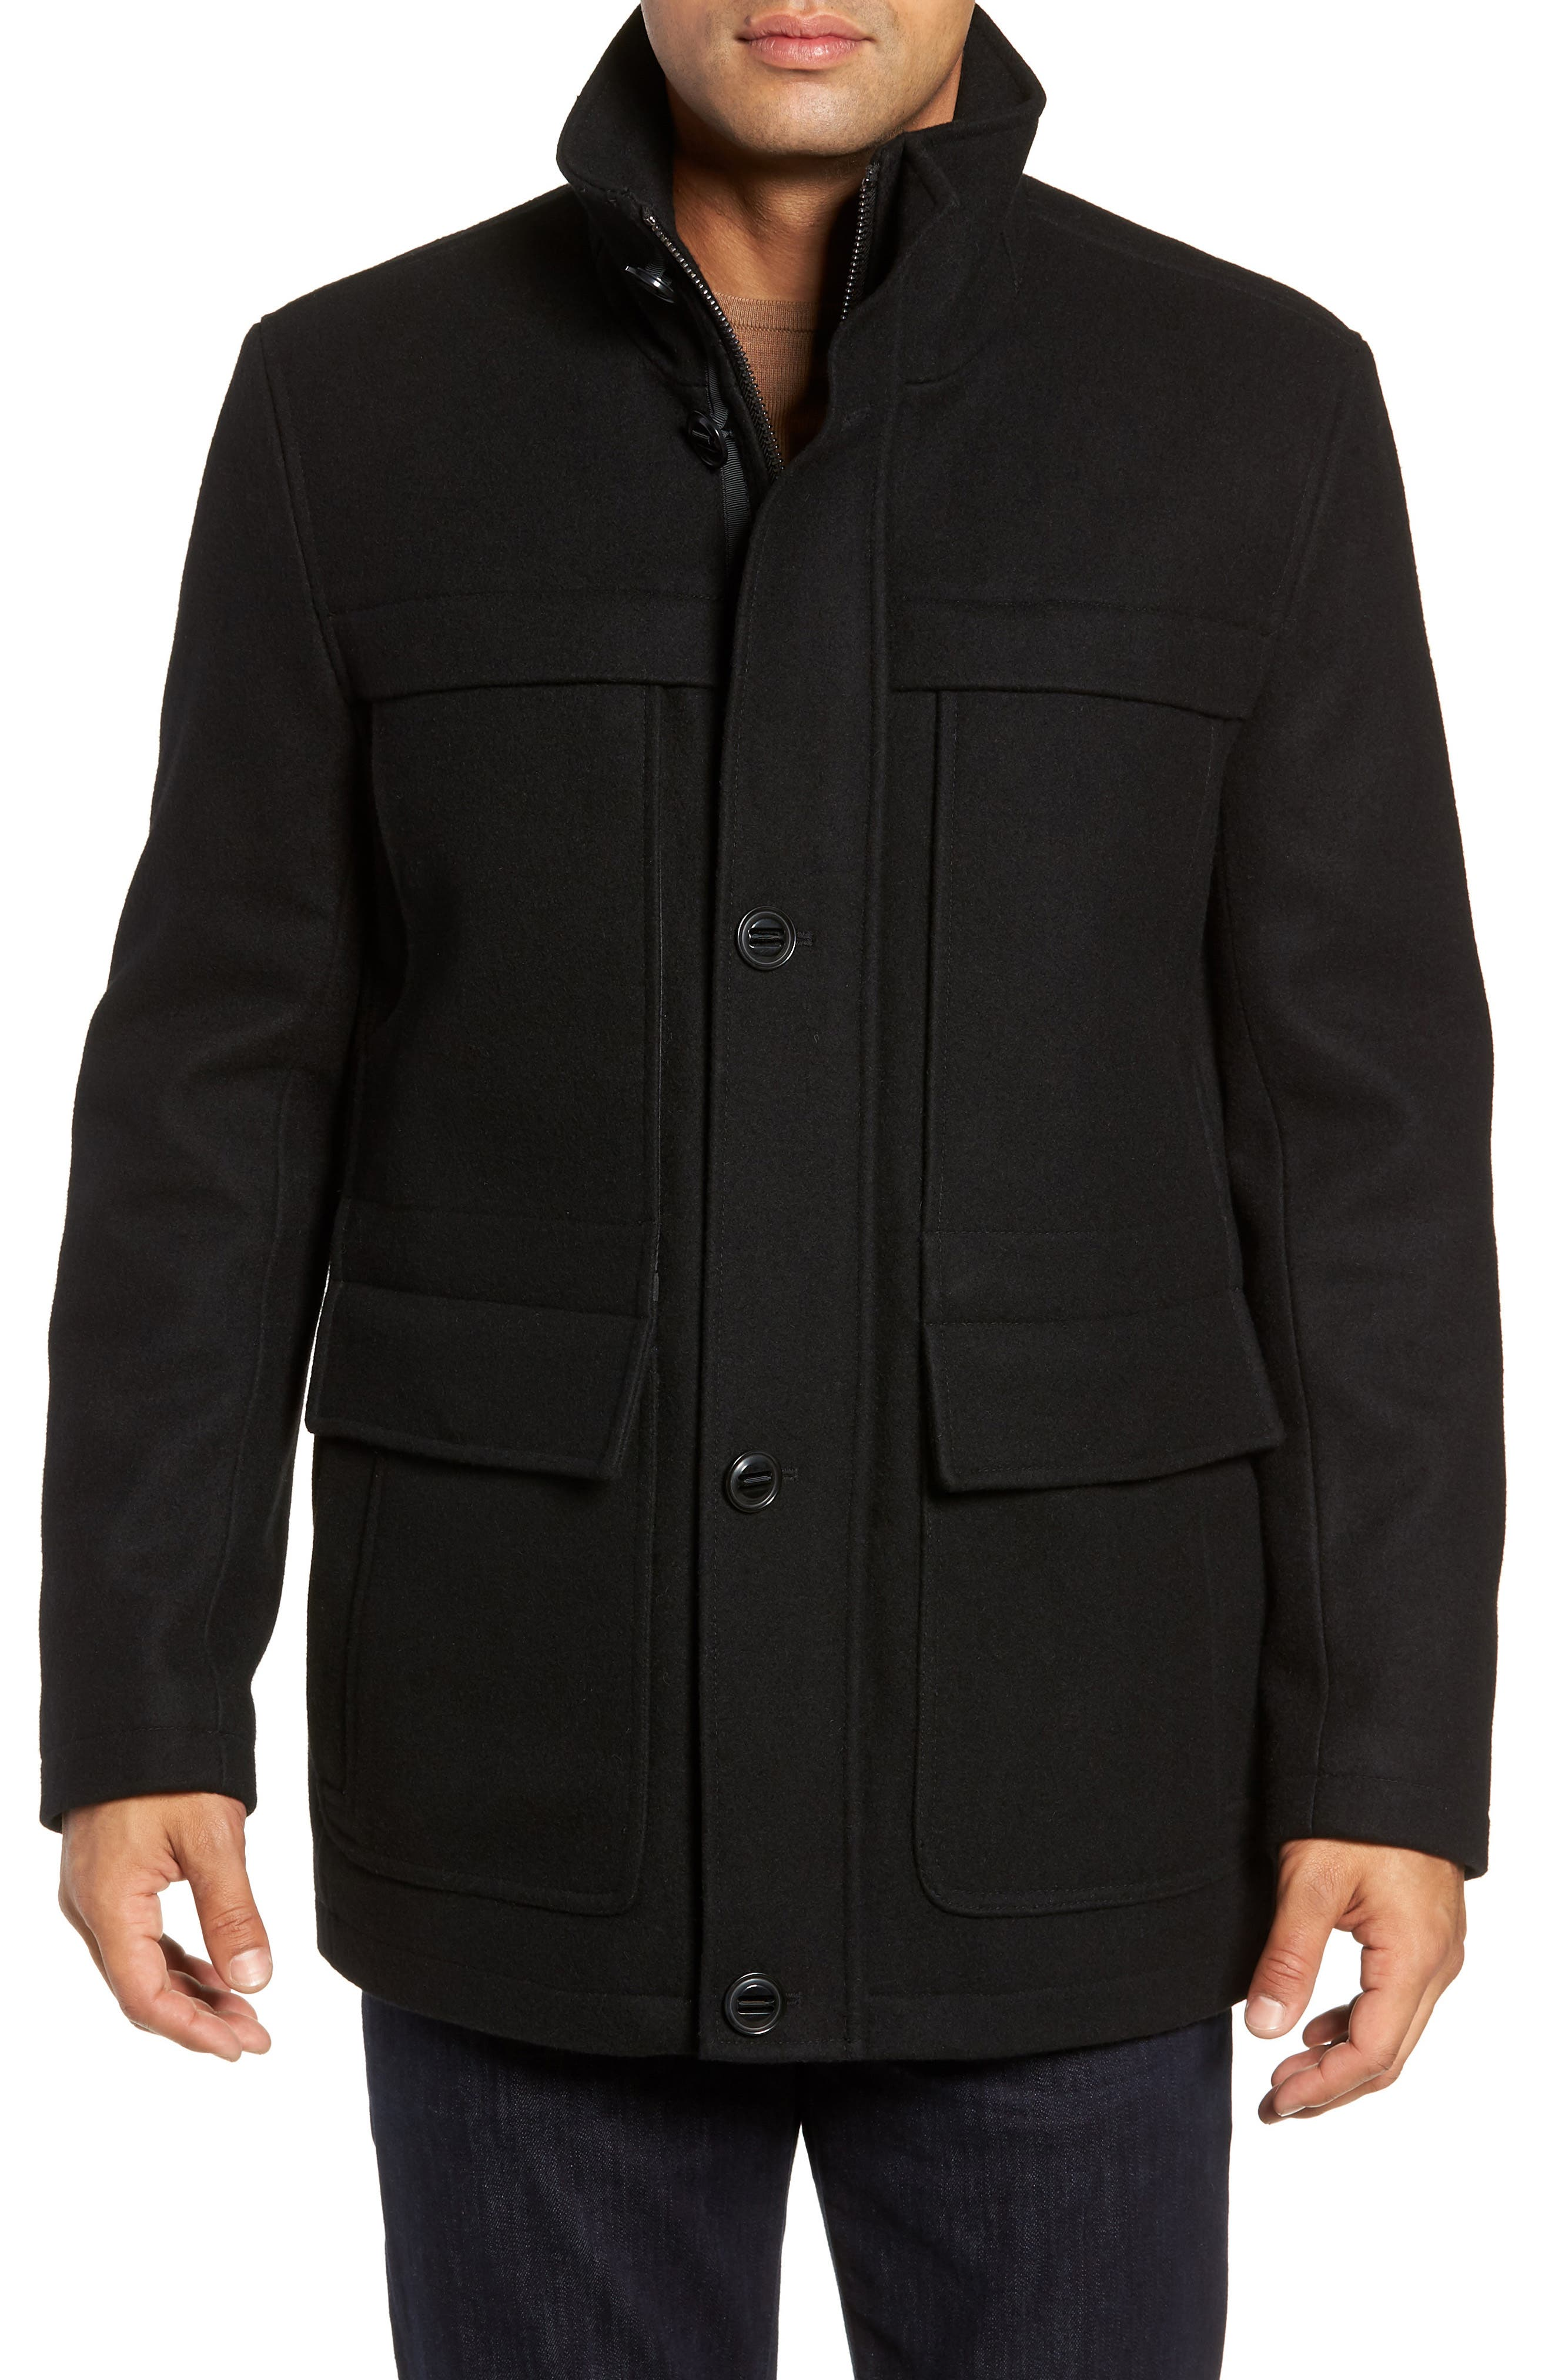 MARC NEW YORK, Brantley Wool Blend Car Coat, Alternate thumbnail 5, color, 001